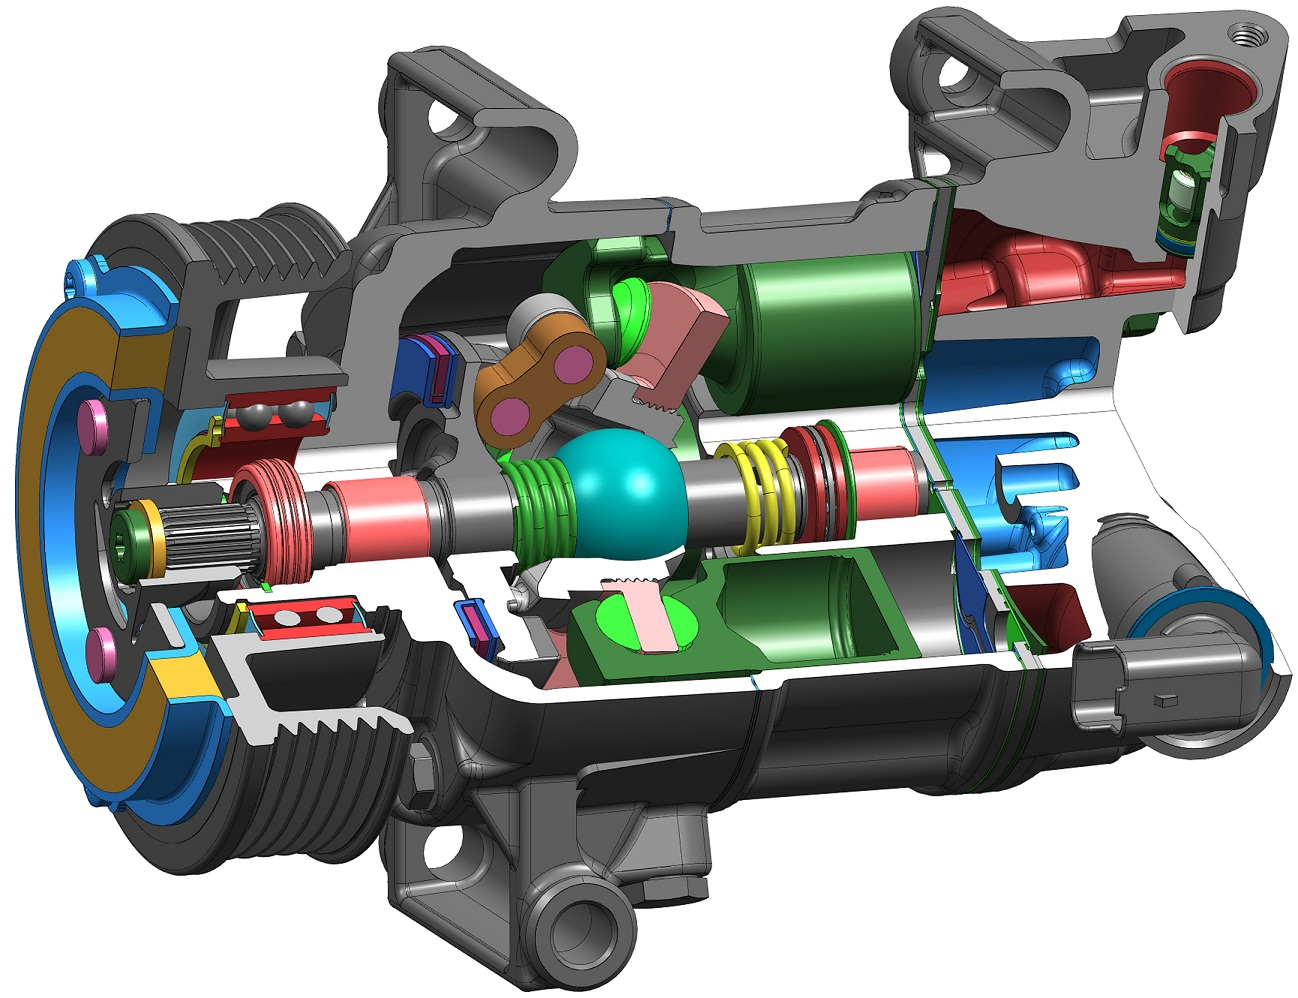 Delphi 5 Cylinder Cvc Compressor Walthamstow Central Garage